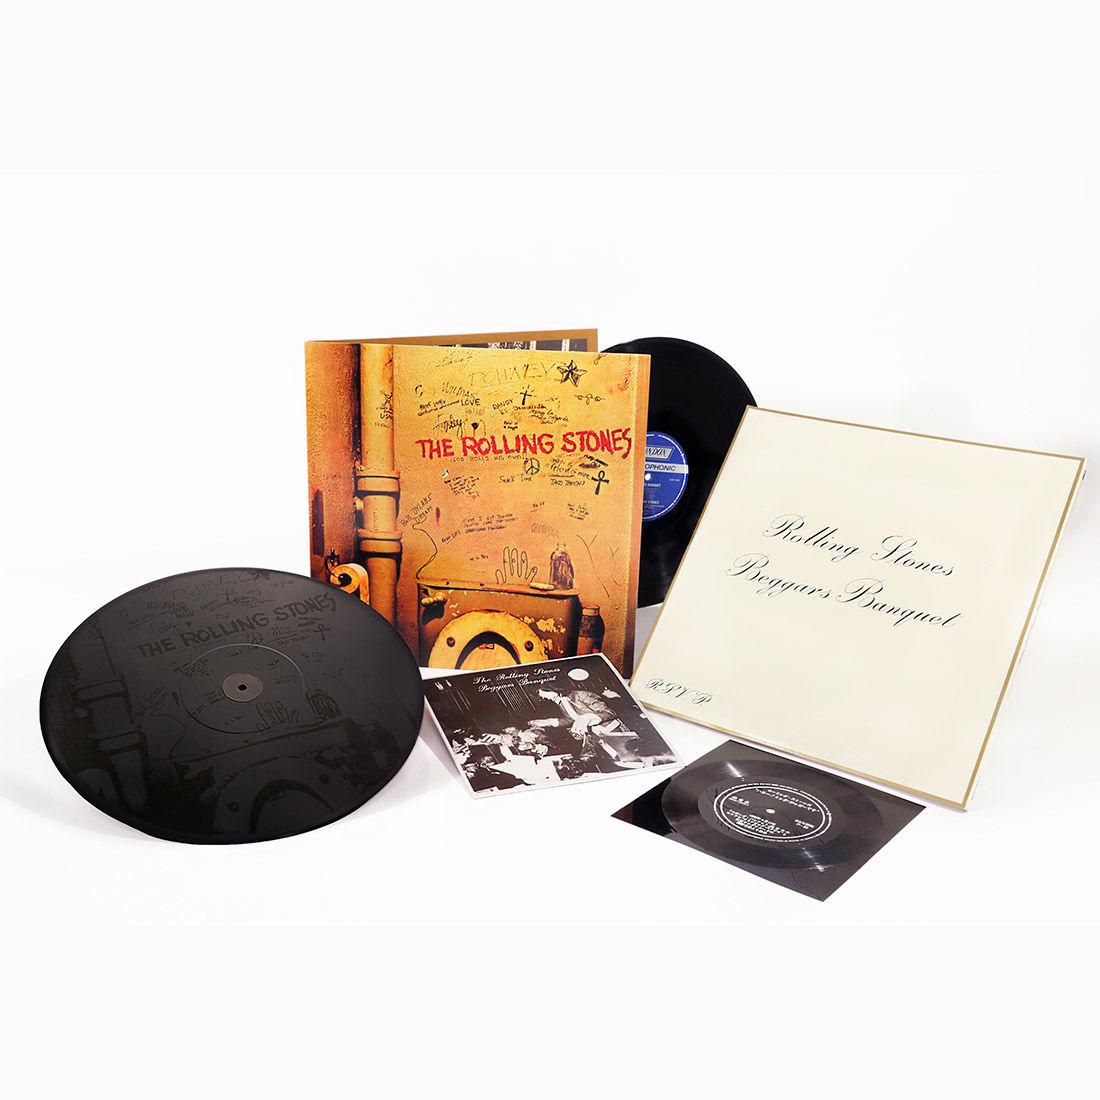 "The Rolling Stones - Beggars Banquet [VINYL] Limited Edition Flexi-disc, 7"" vinyl, Box Set £17.99 (Prime) / £20.98 (non Prime) at Amazon"